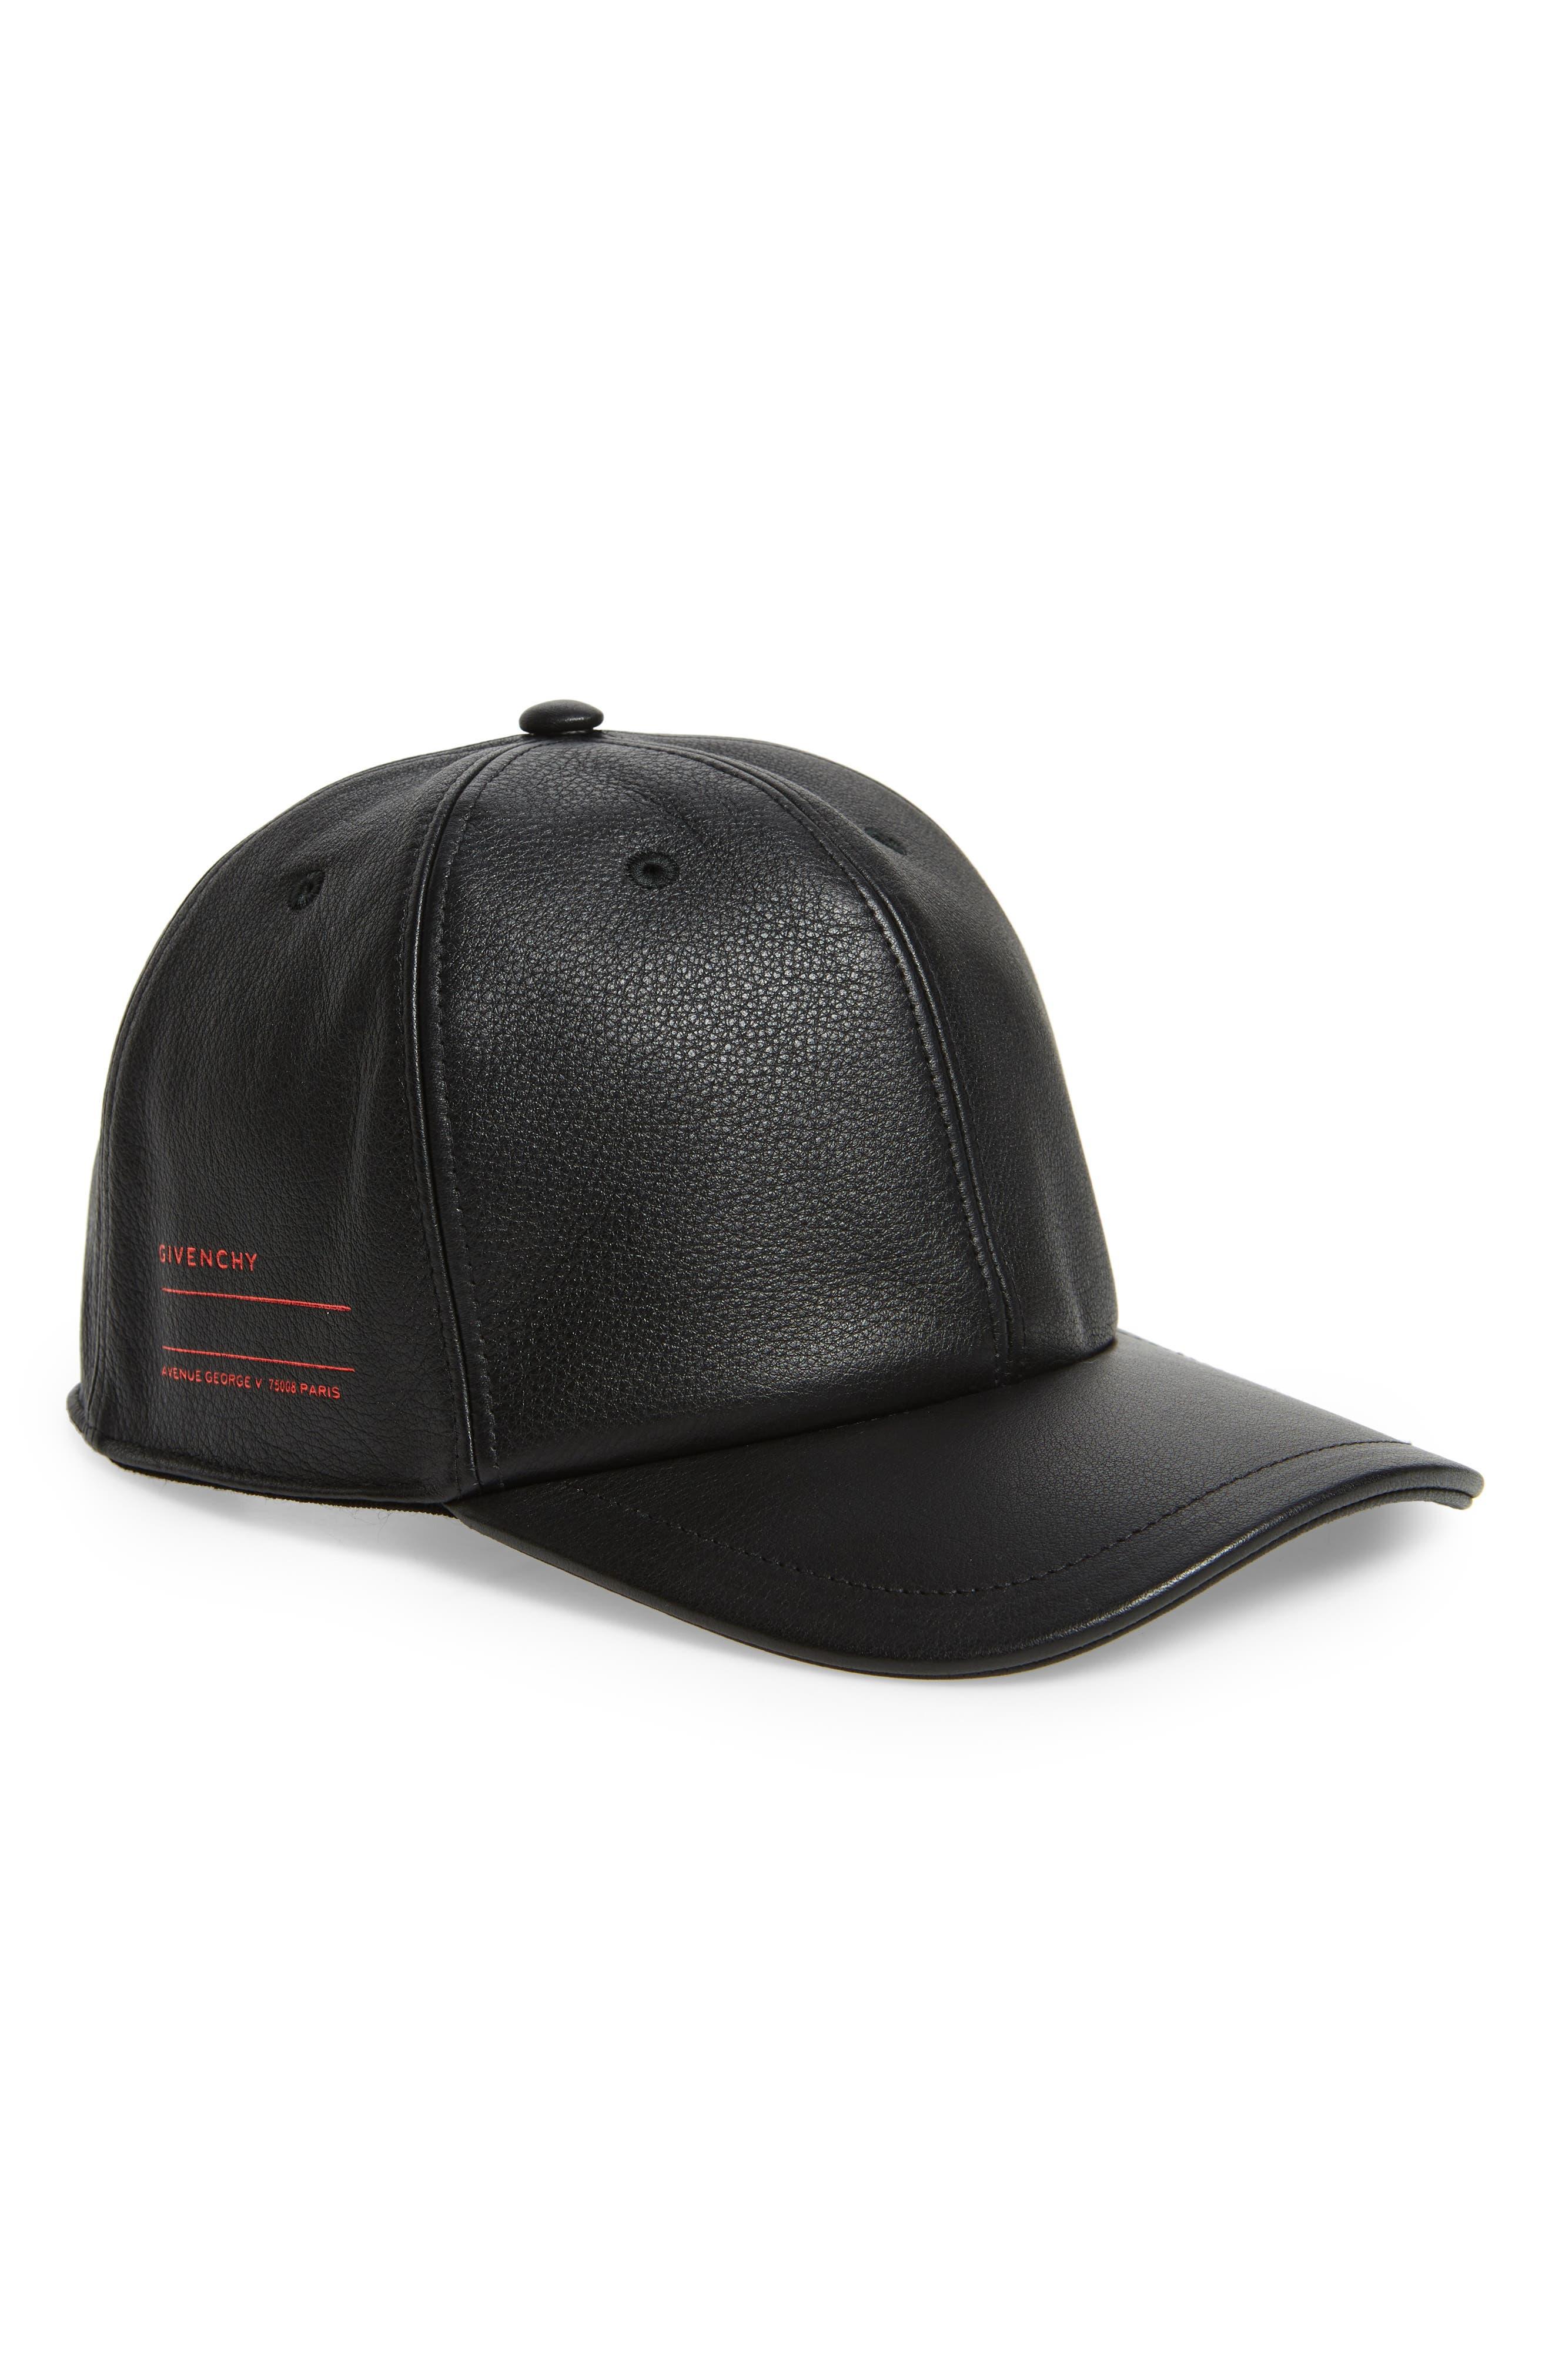 Leather Ball Cap,                         Main,                         color, Black/ White